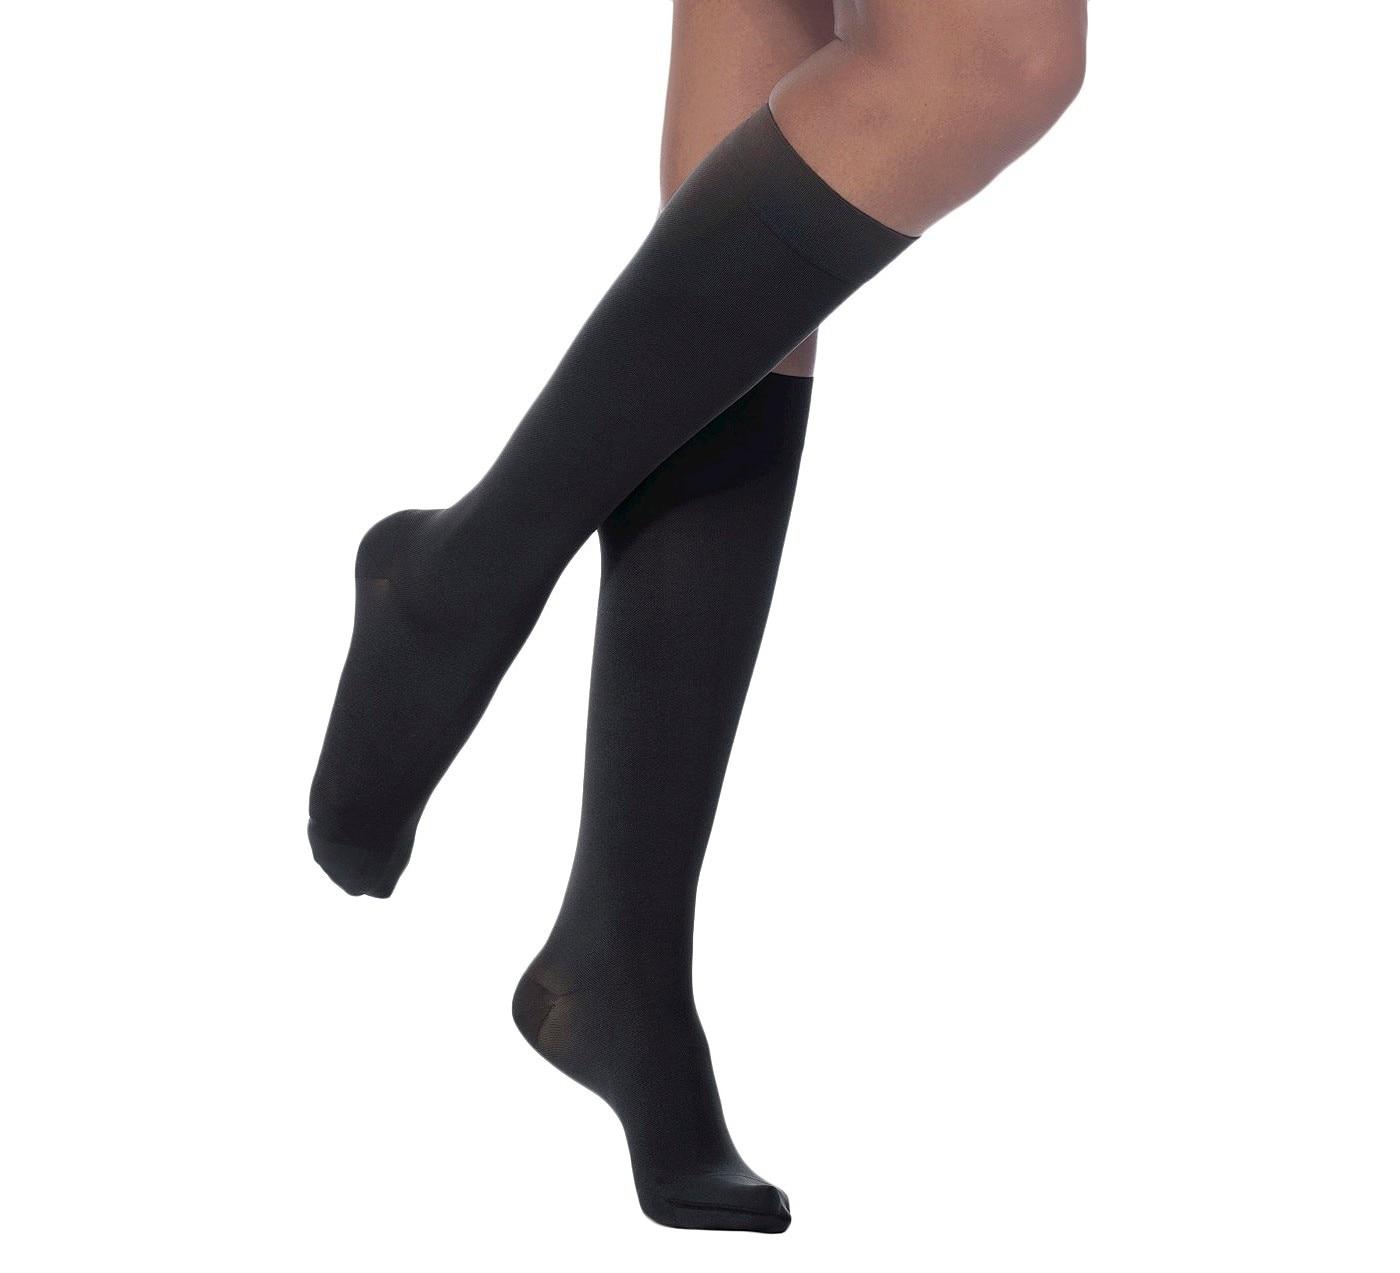 HTB1pMvvbdfvK1RjSspfq6zzXFXaC - 20-30 mmHg Compression Socks For Women and Men Medical